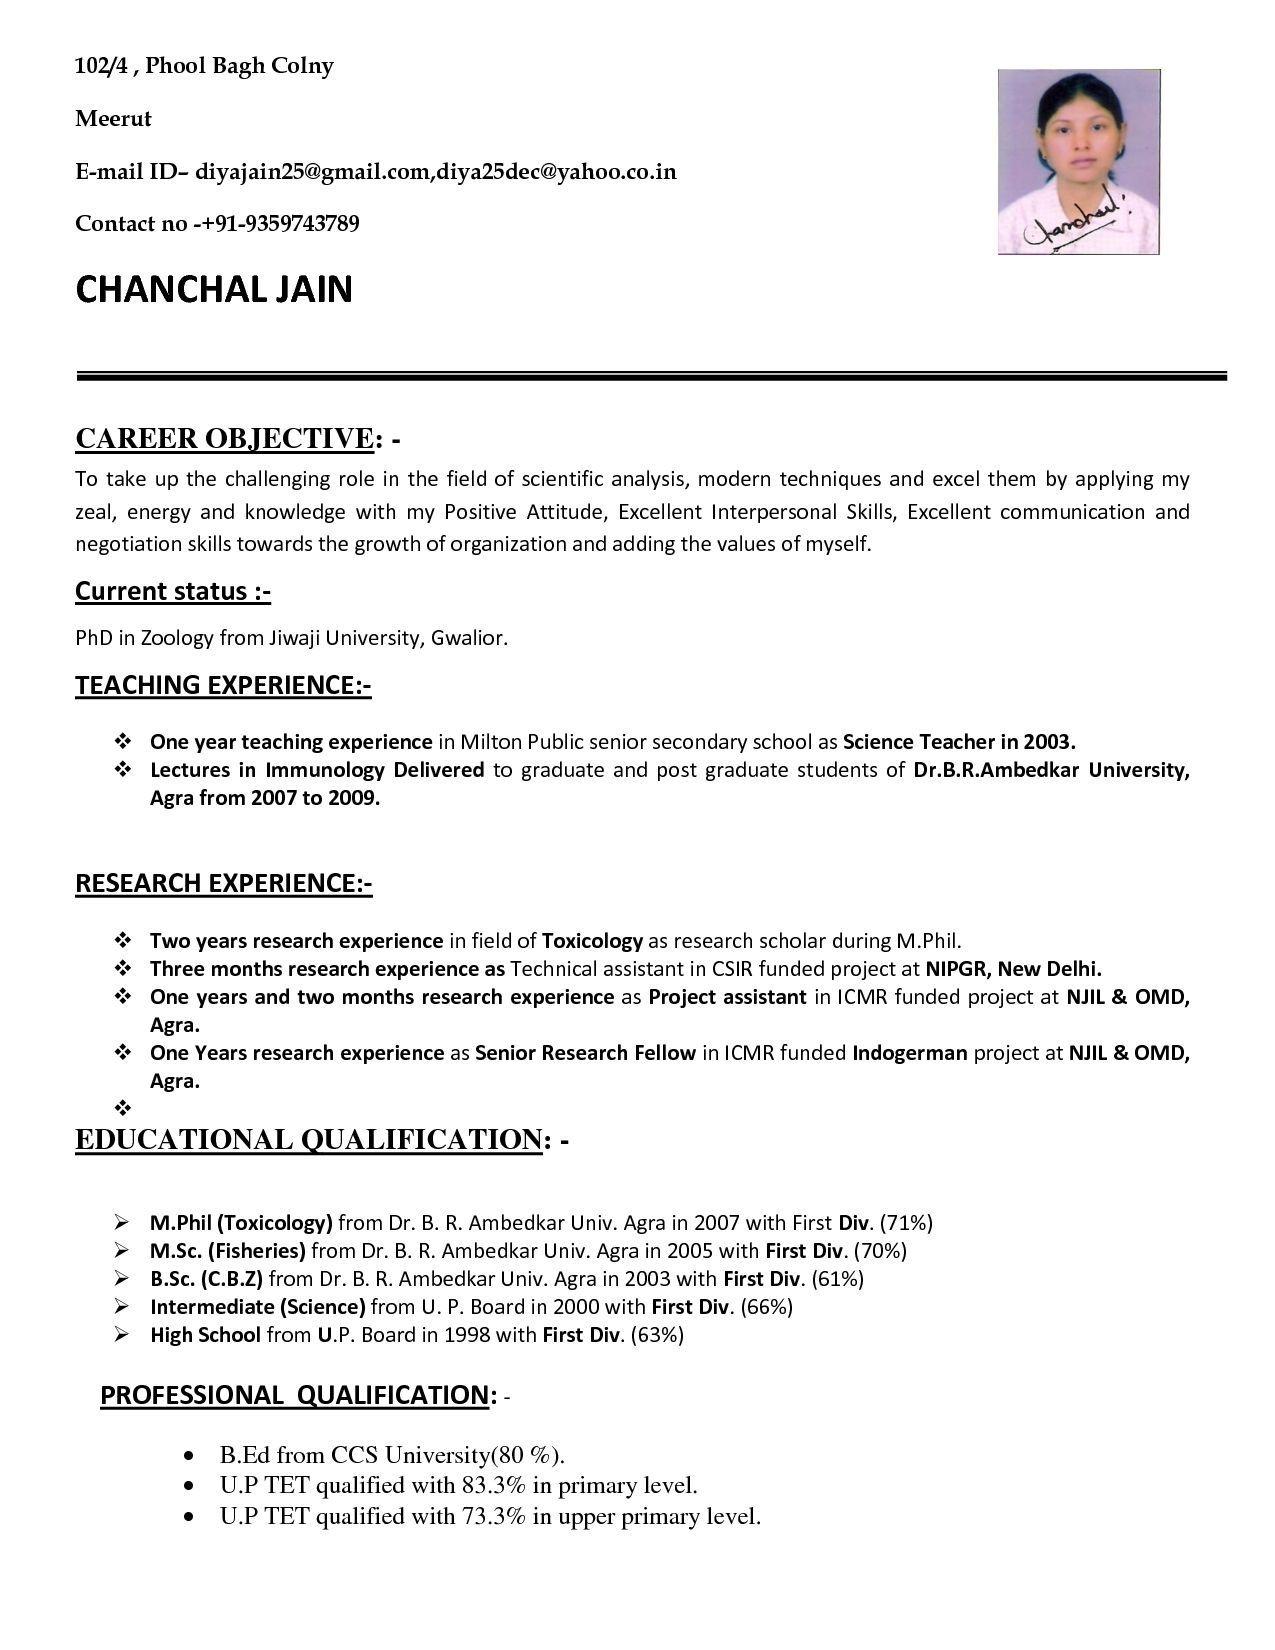 001 Amazing Cv Template For Teacher Job Inspiration  Example Education Sample ComputerFull